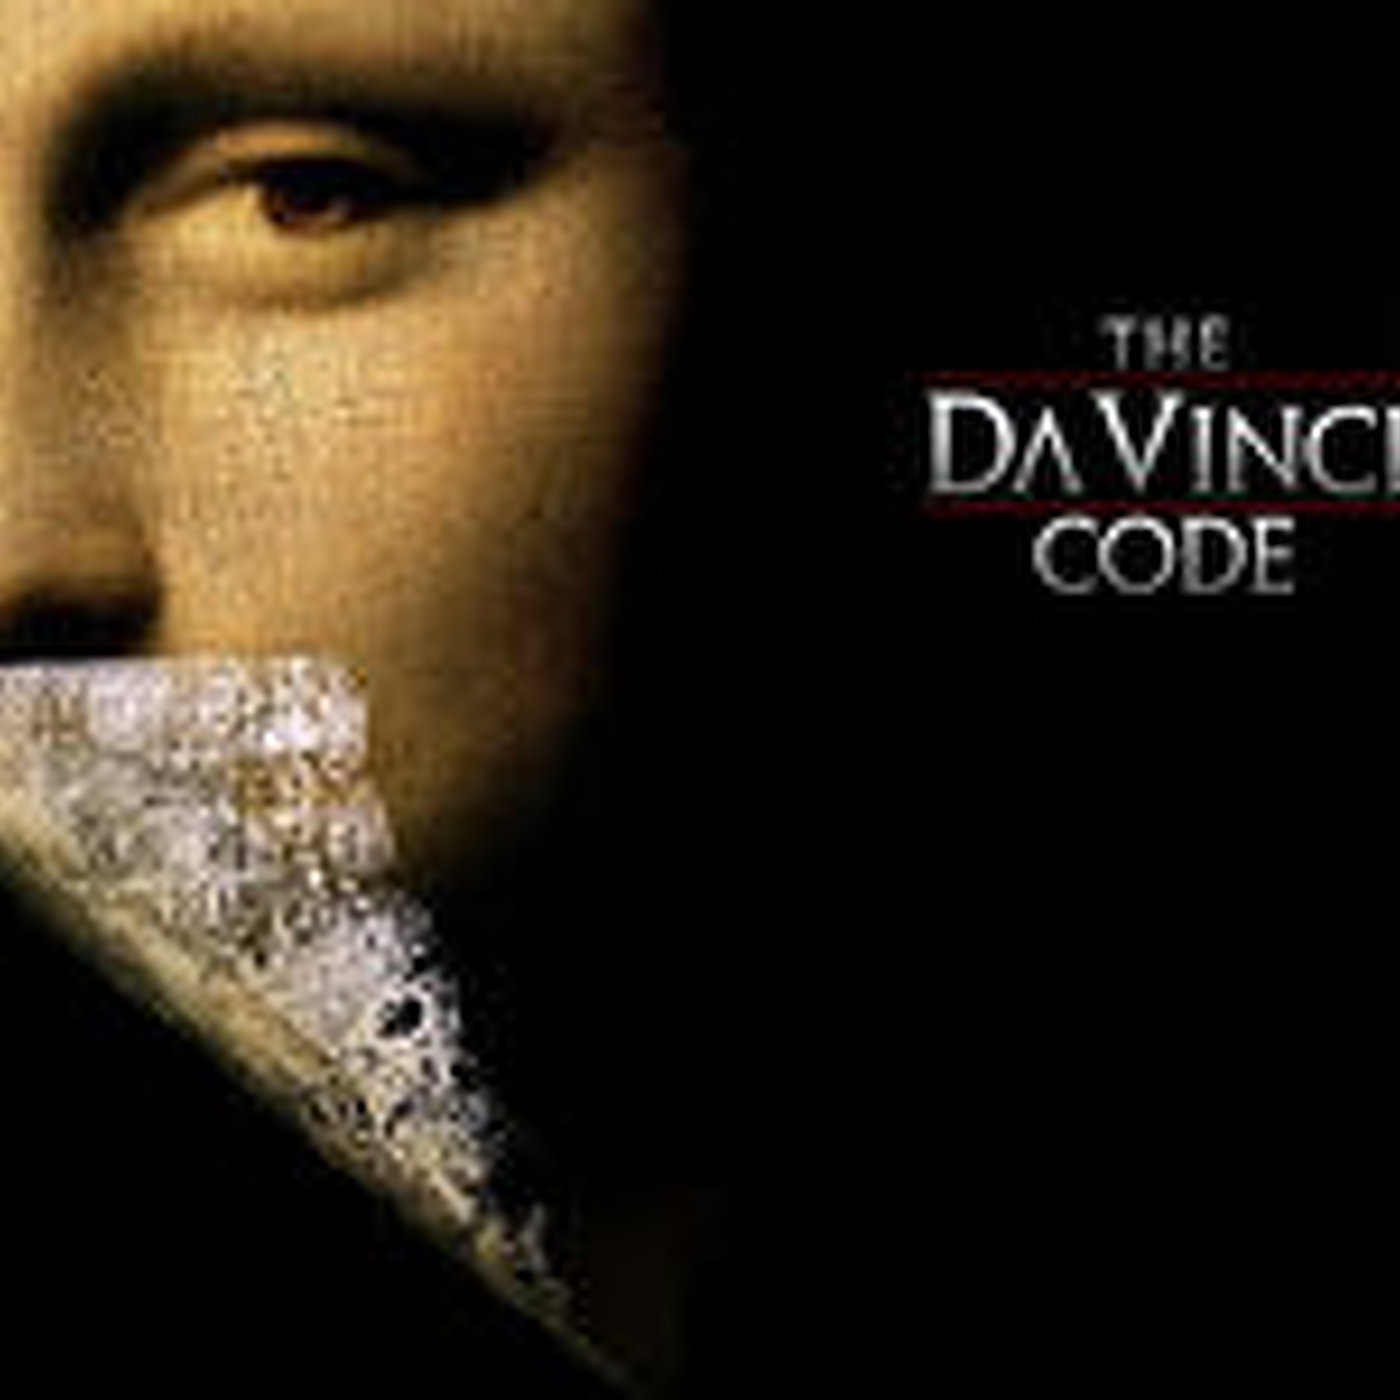 El Código Da Vinci Voz Humana [9de10]